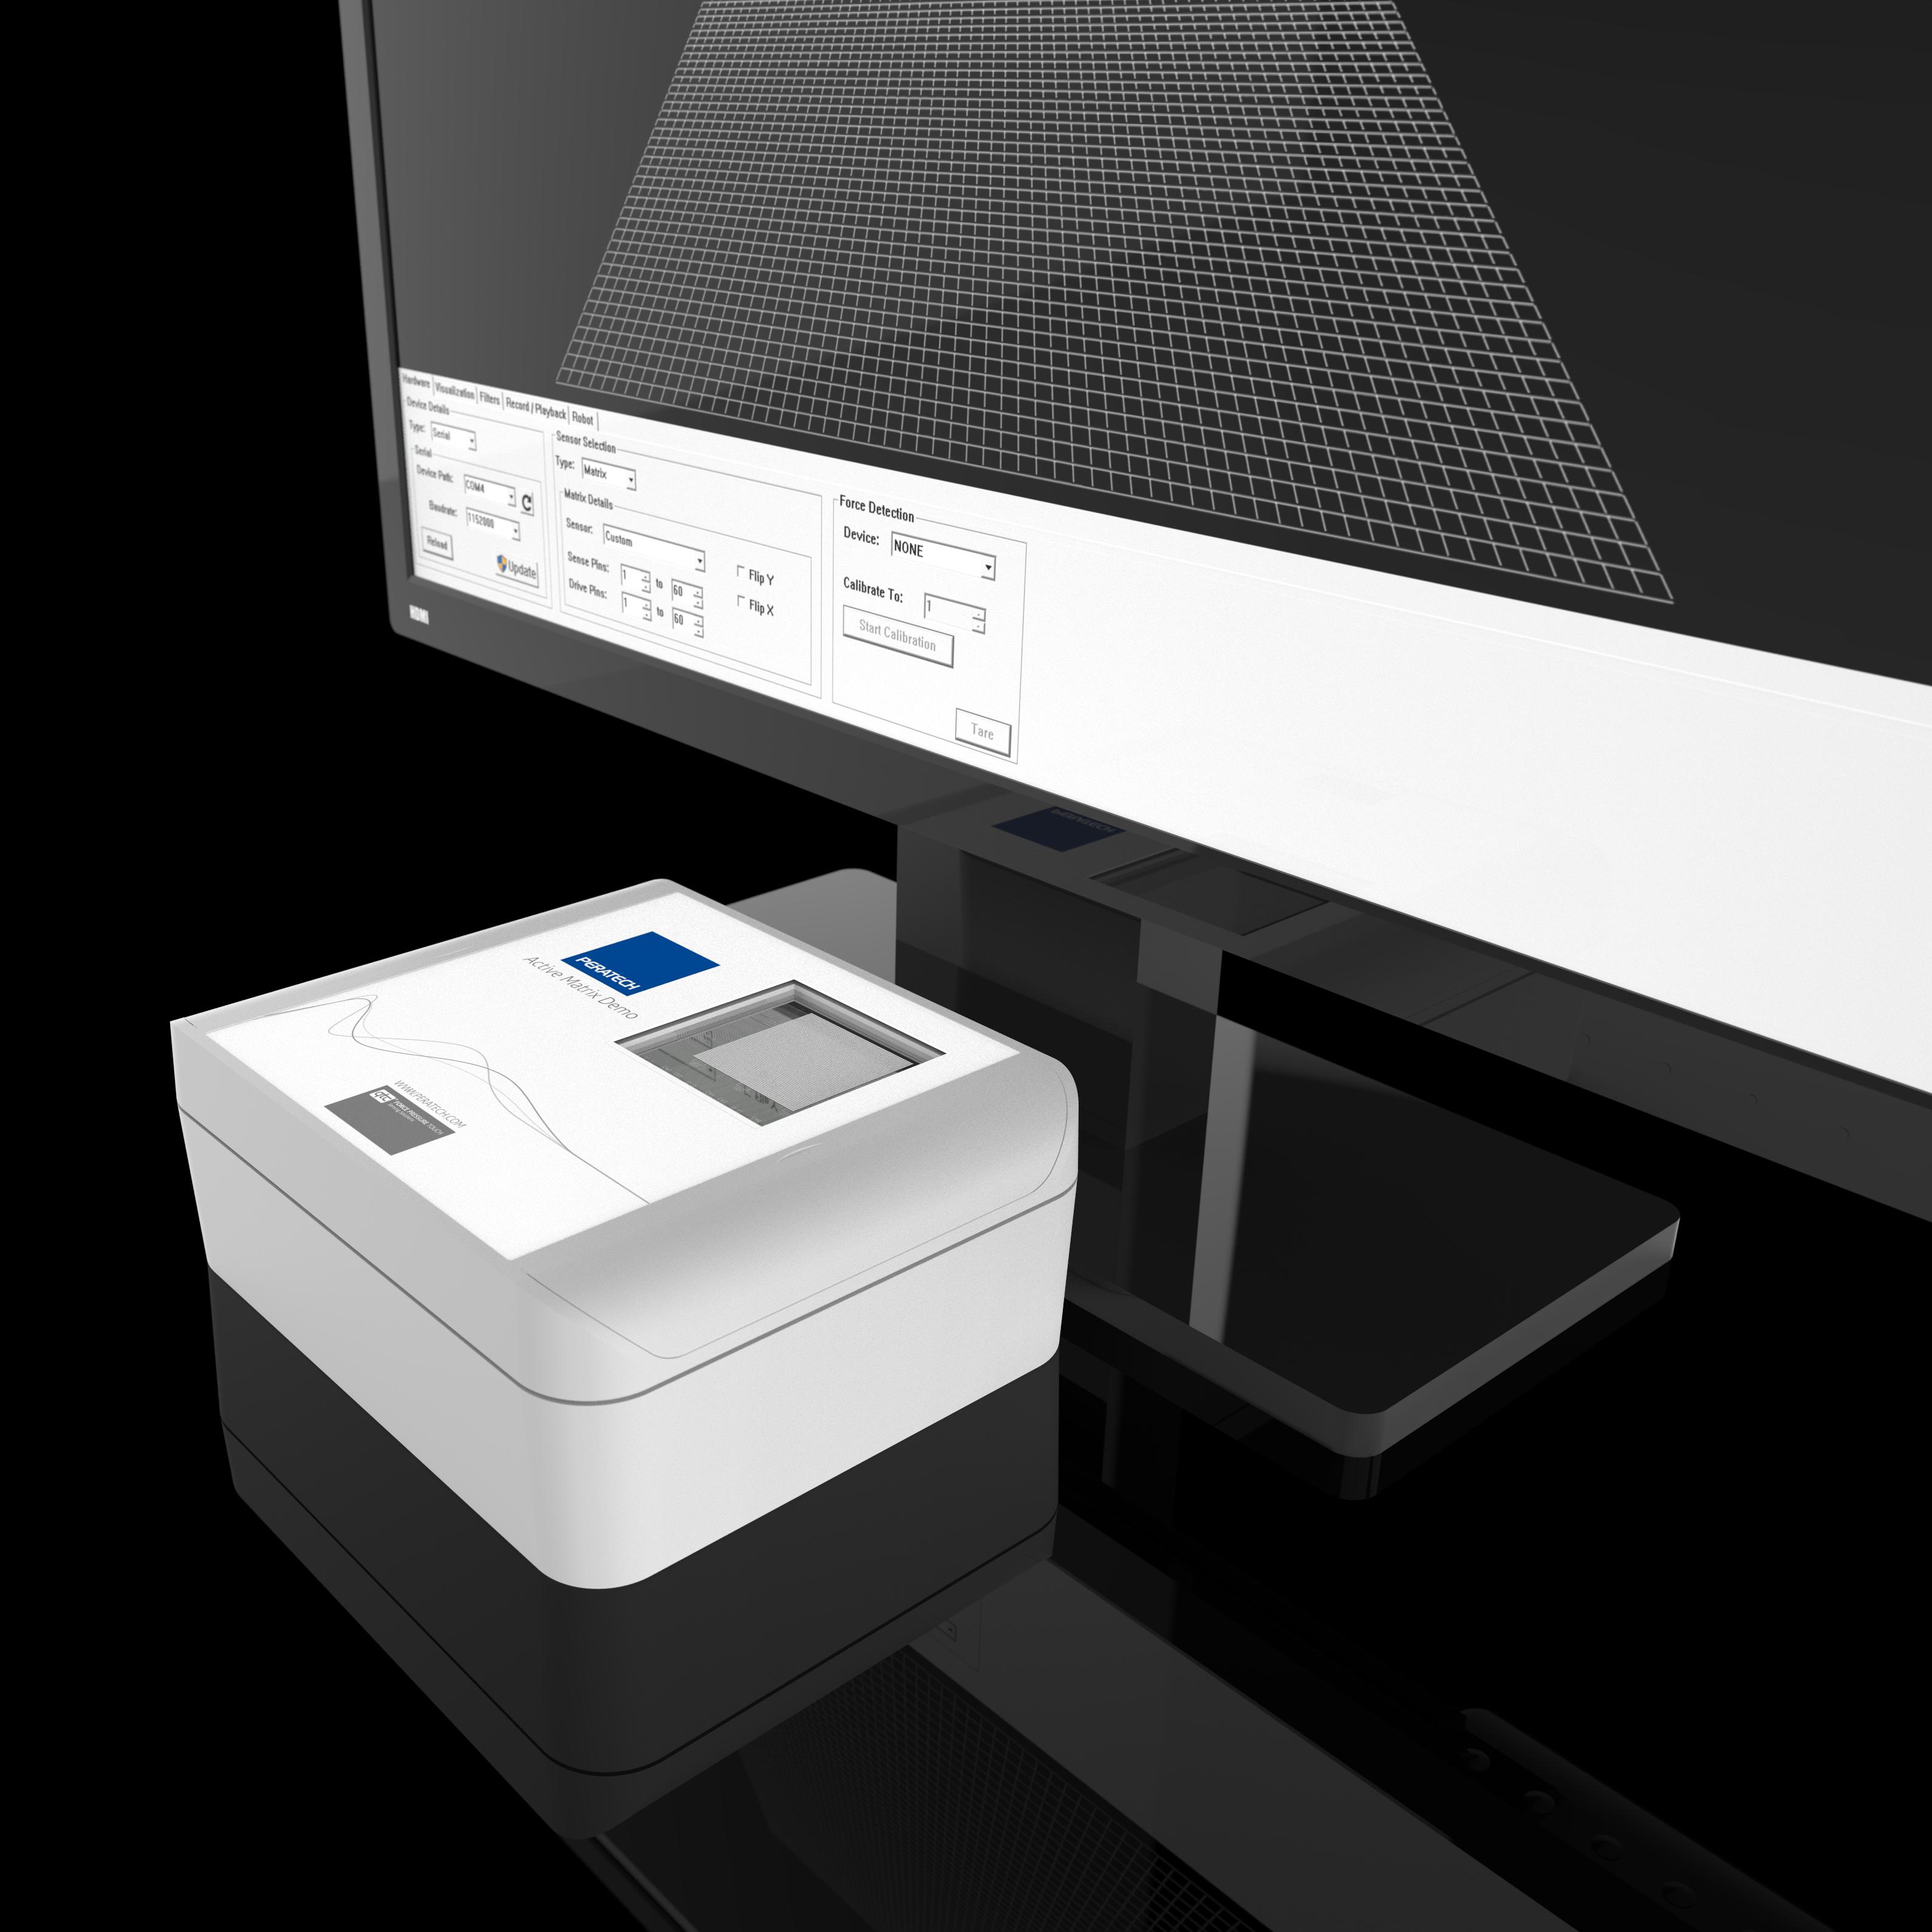 Peratech - Active matrix sensor based on TFT display